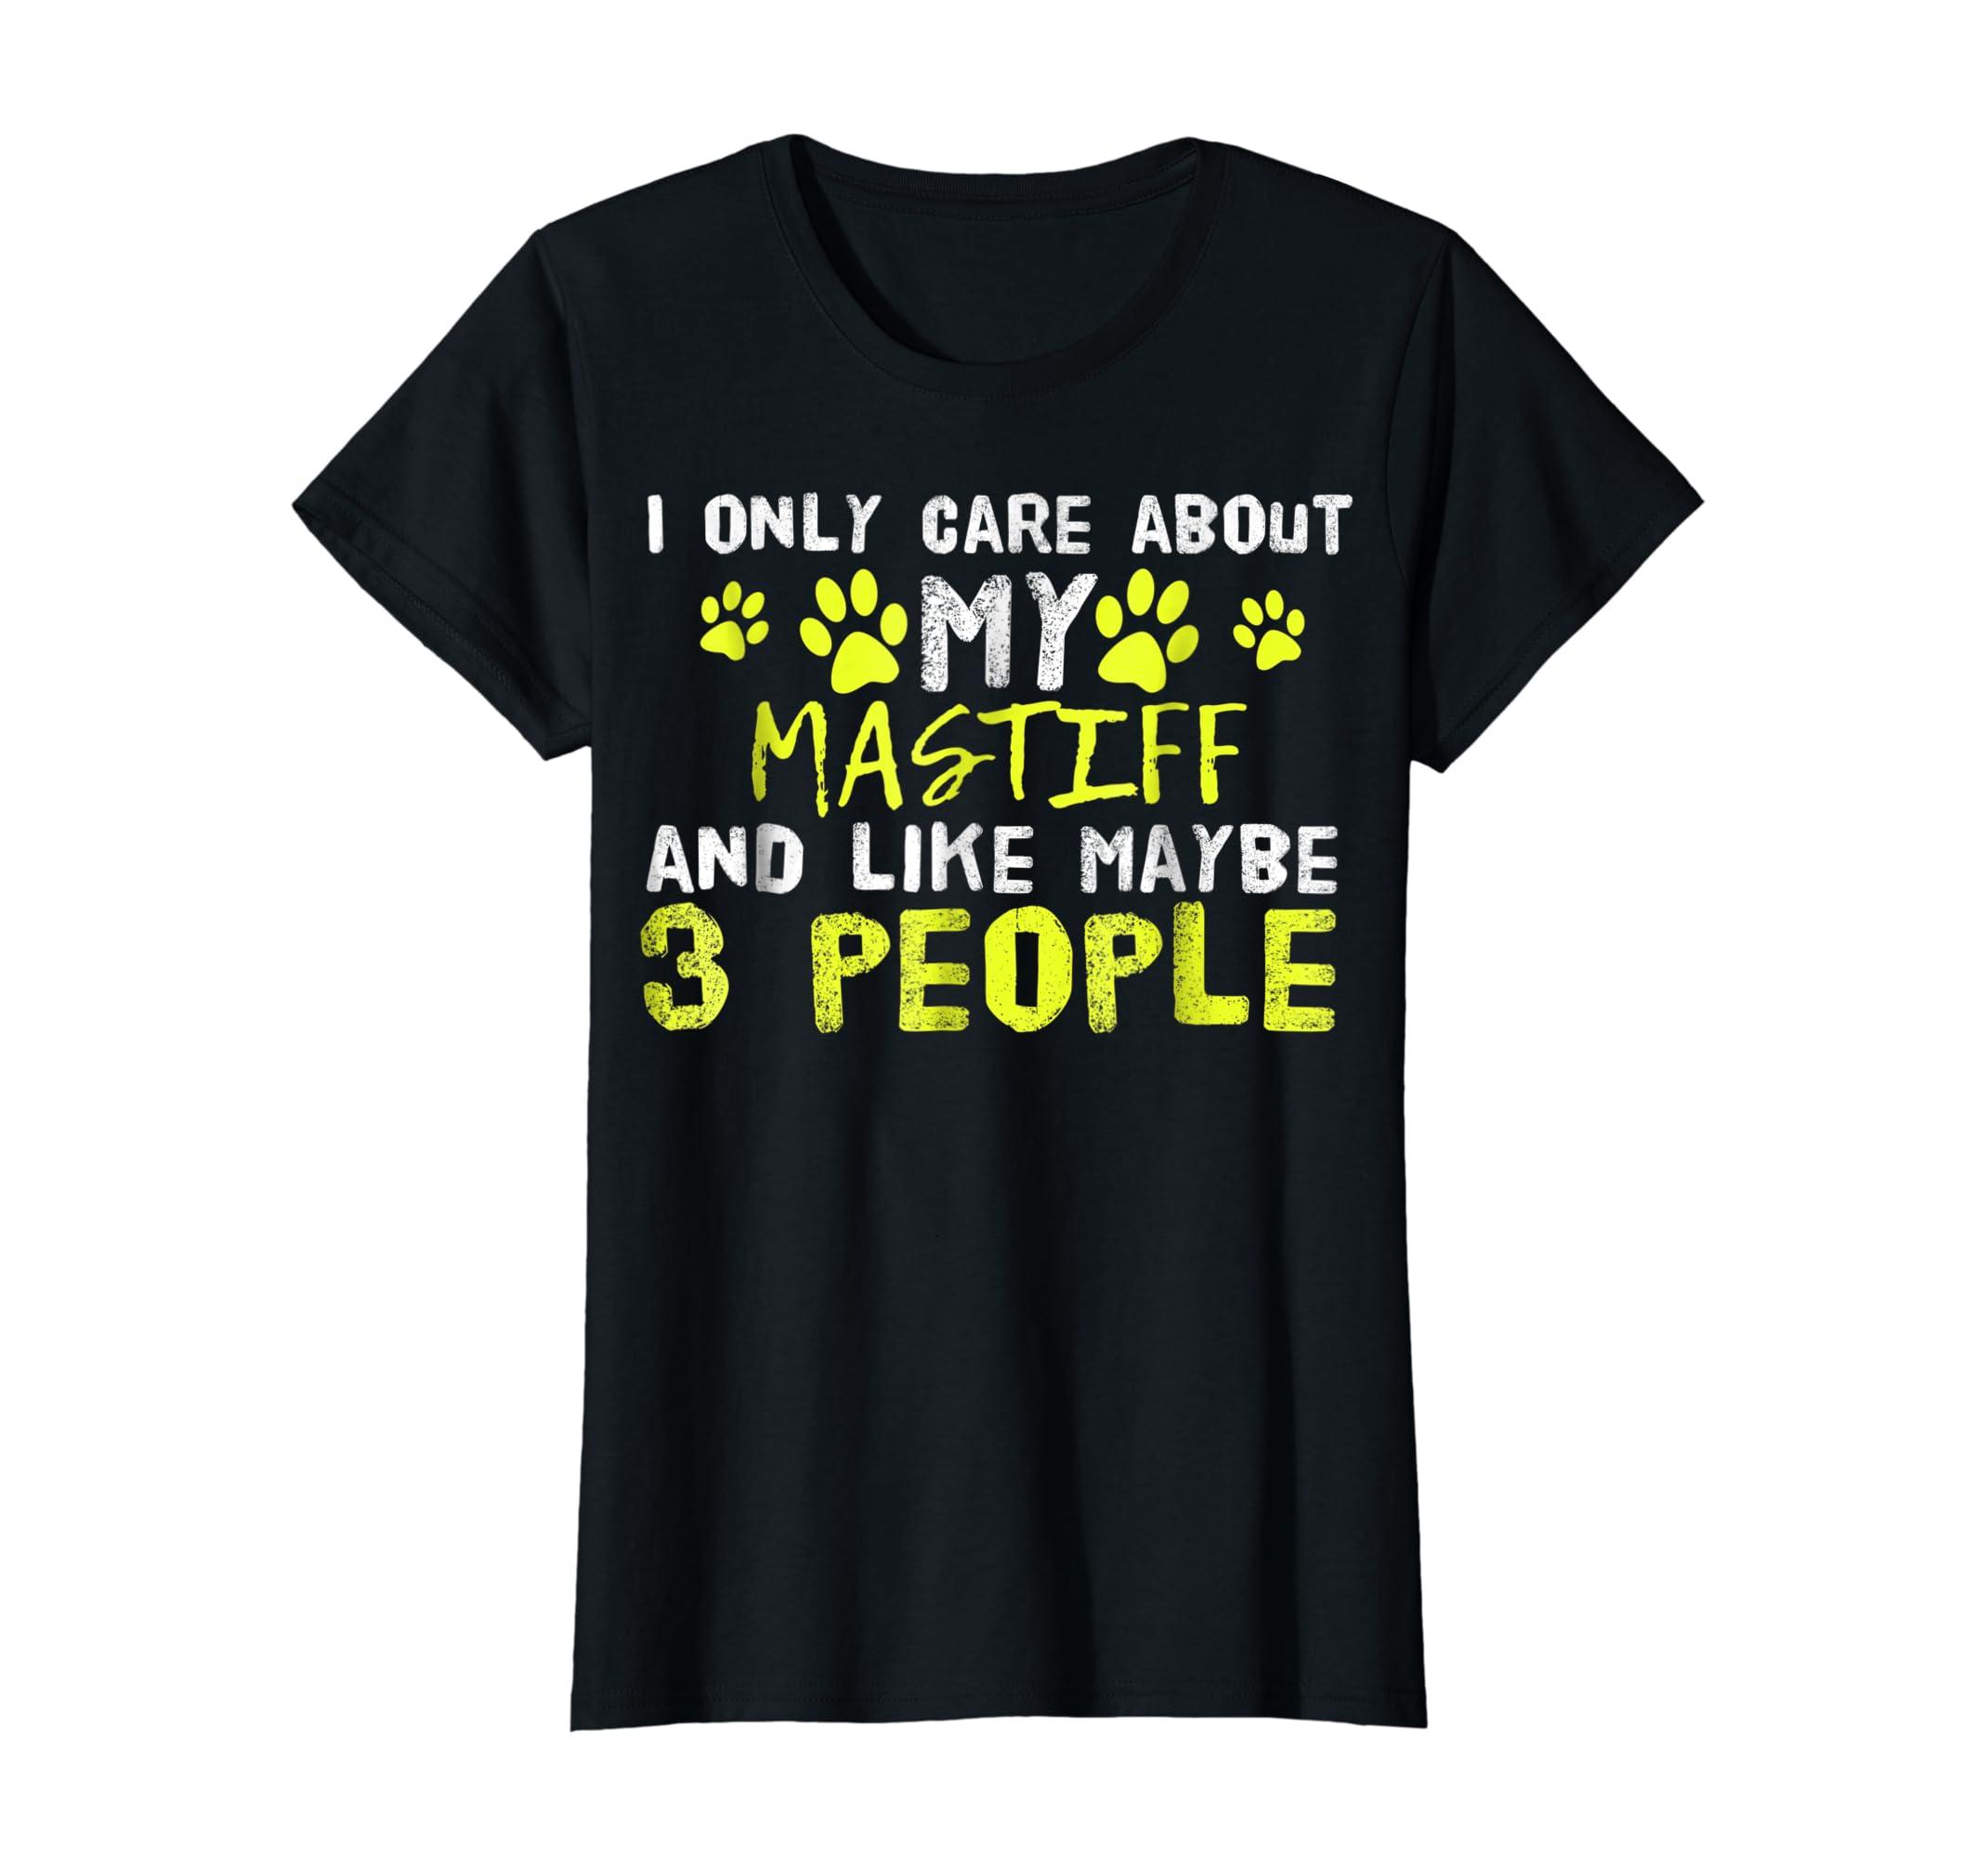 Mastiff Dog Shirt Introvert Love My Dog Tee-Women's T-Shirt-Black